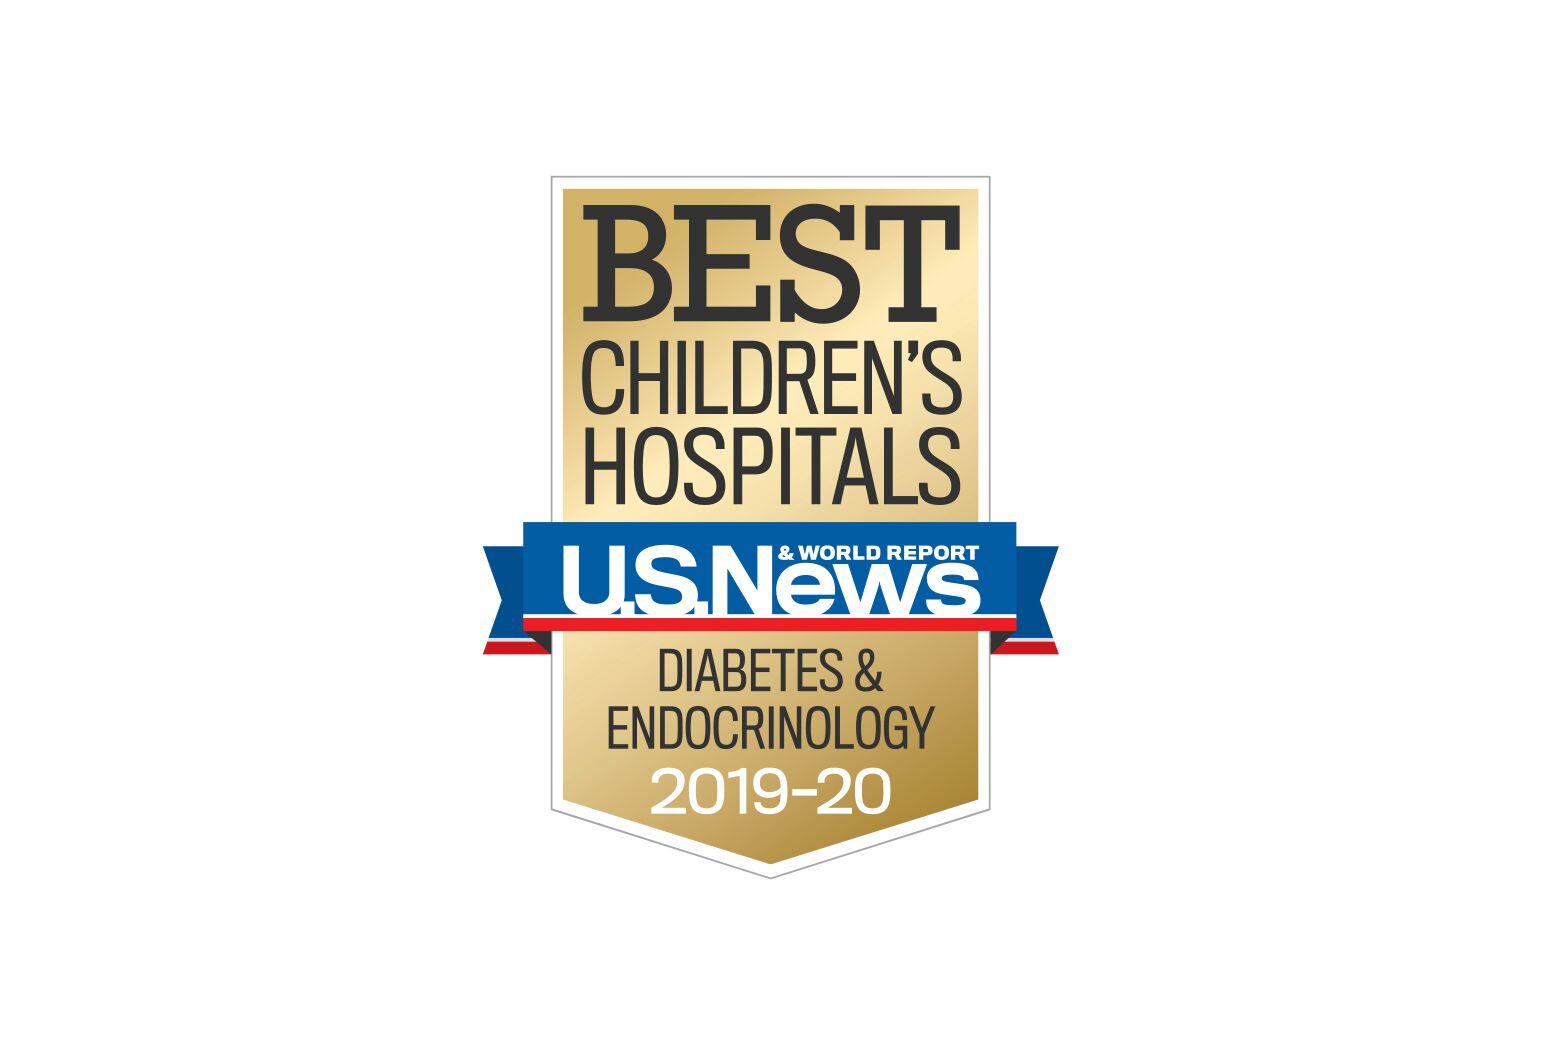 Pediatric endocrinology and diabetes care - Cohen Children's